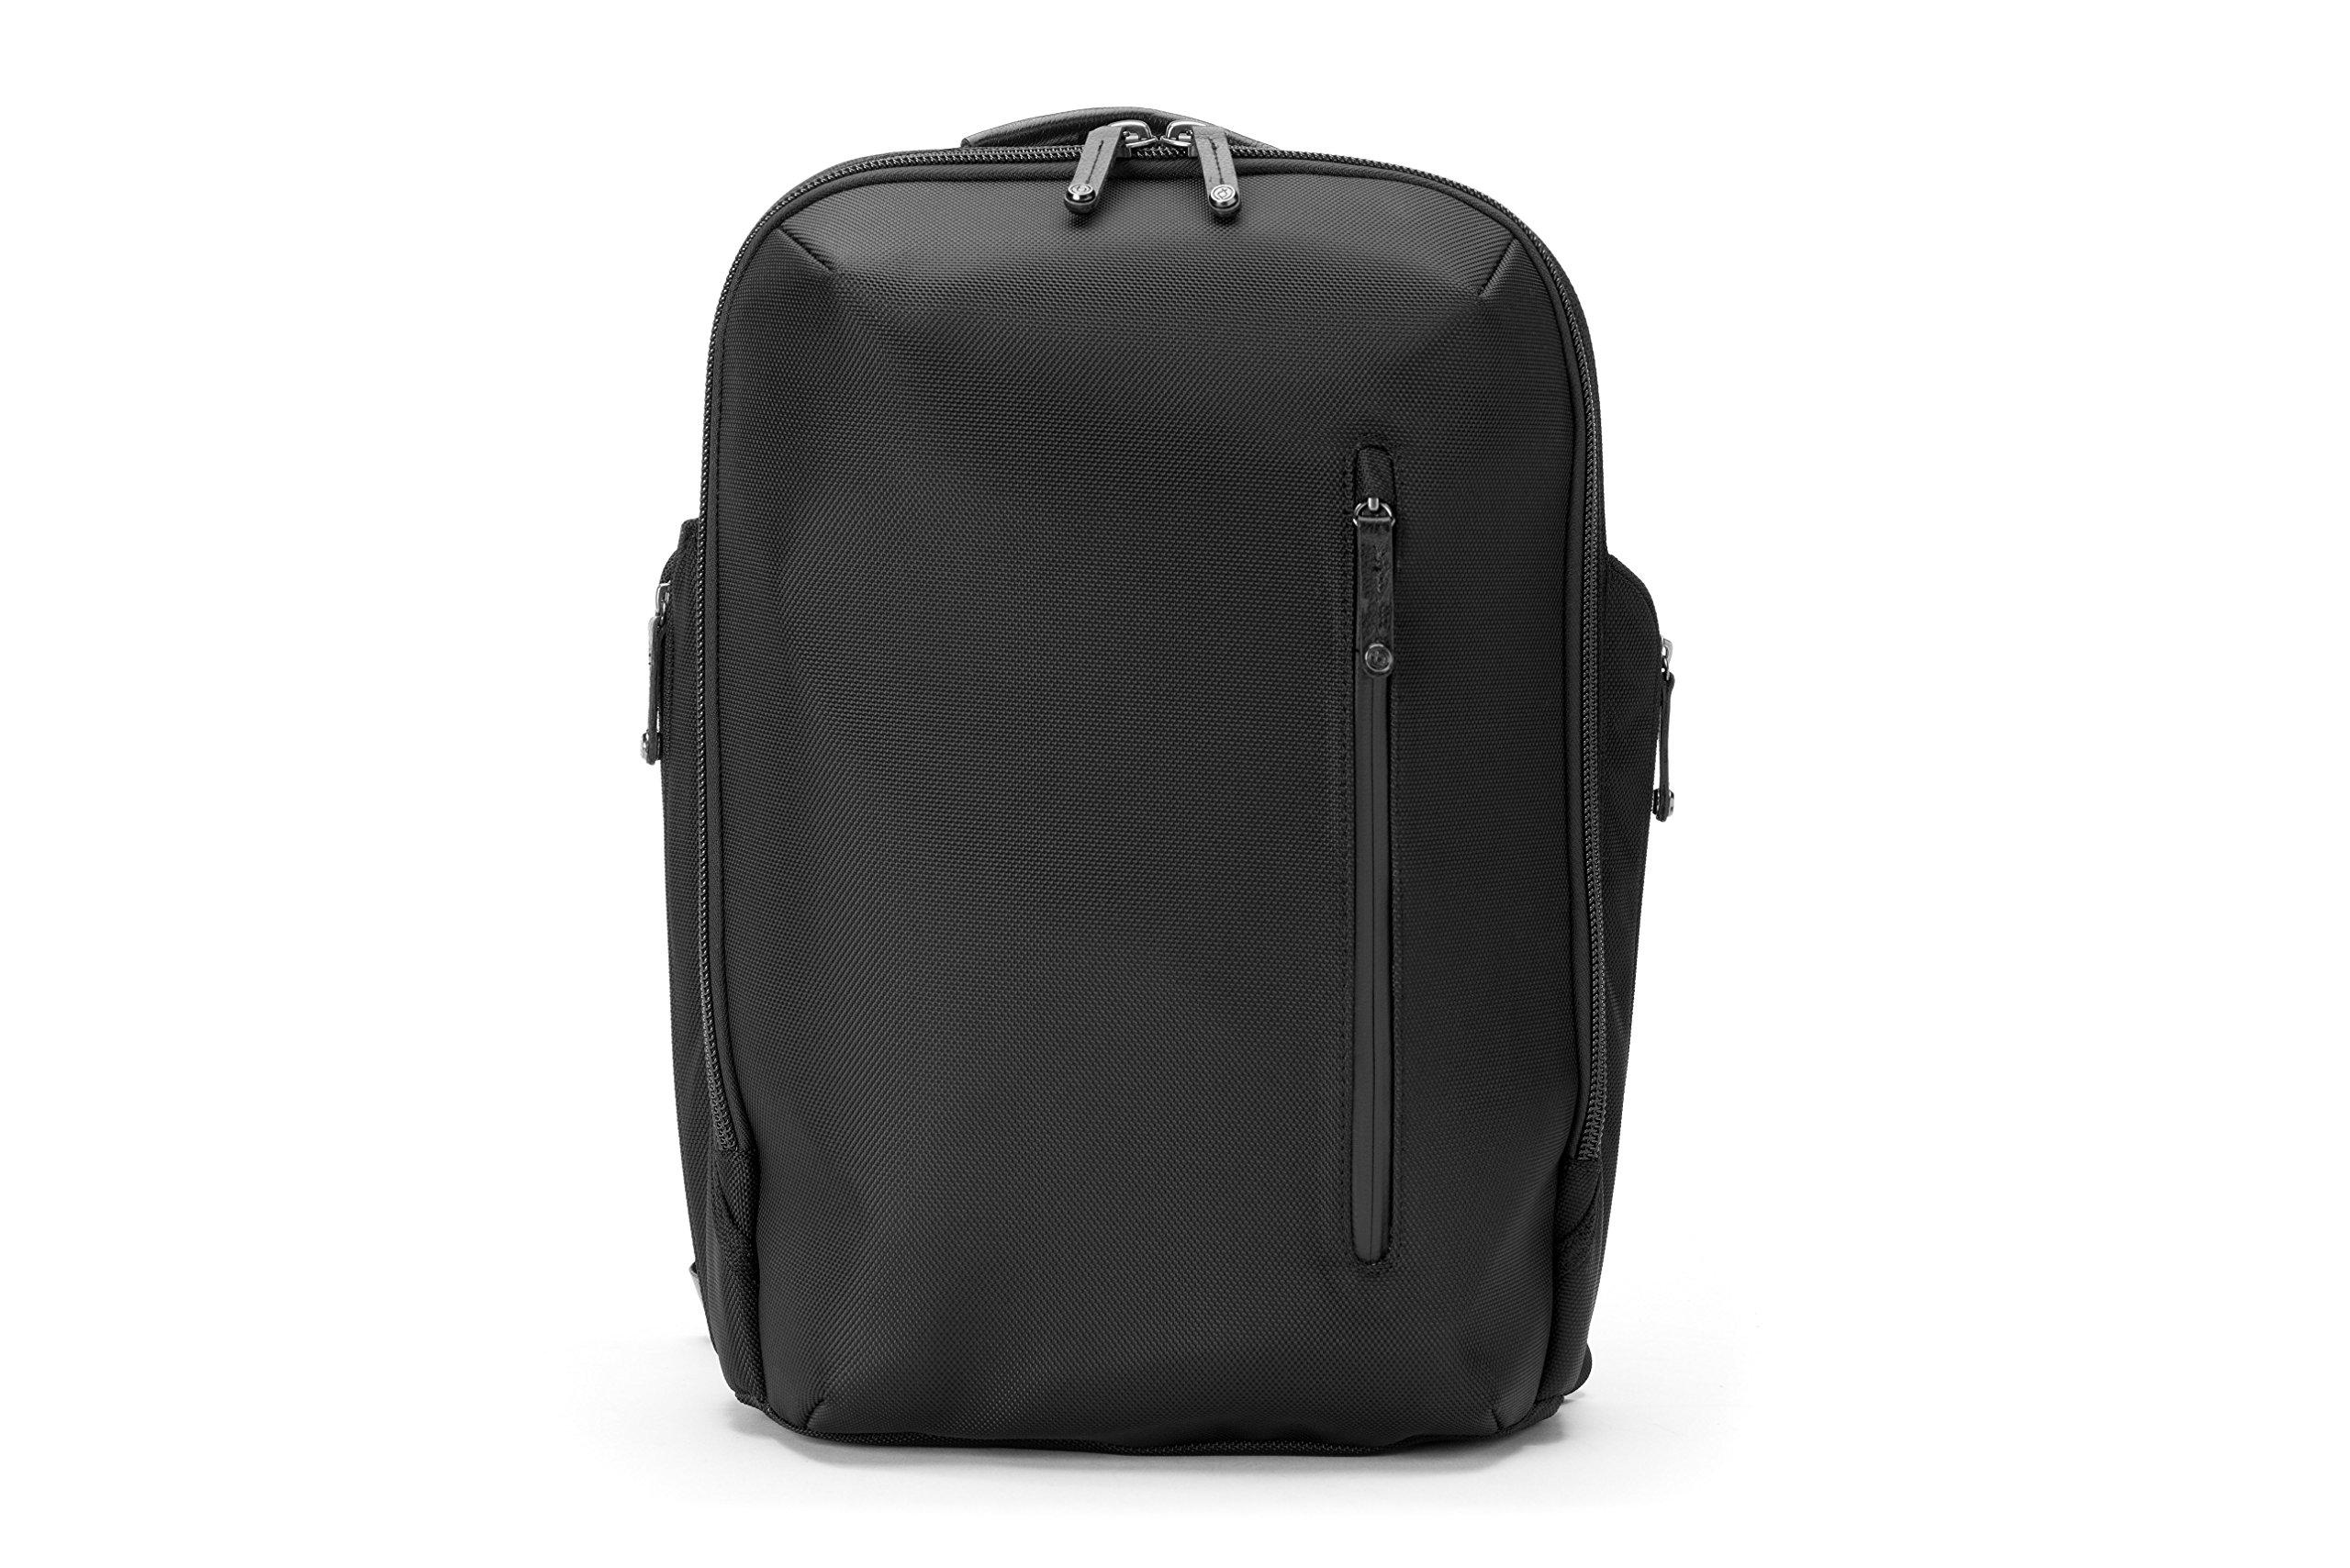 Booq Pack Pro Backpack, Black-Nylon